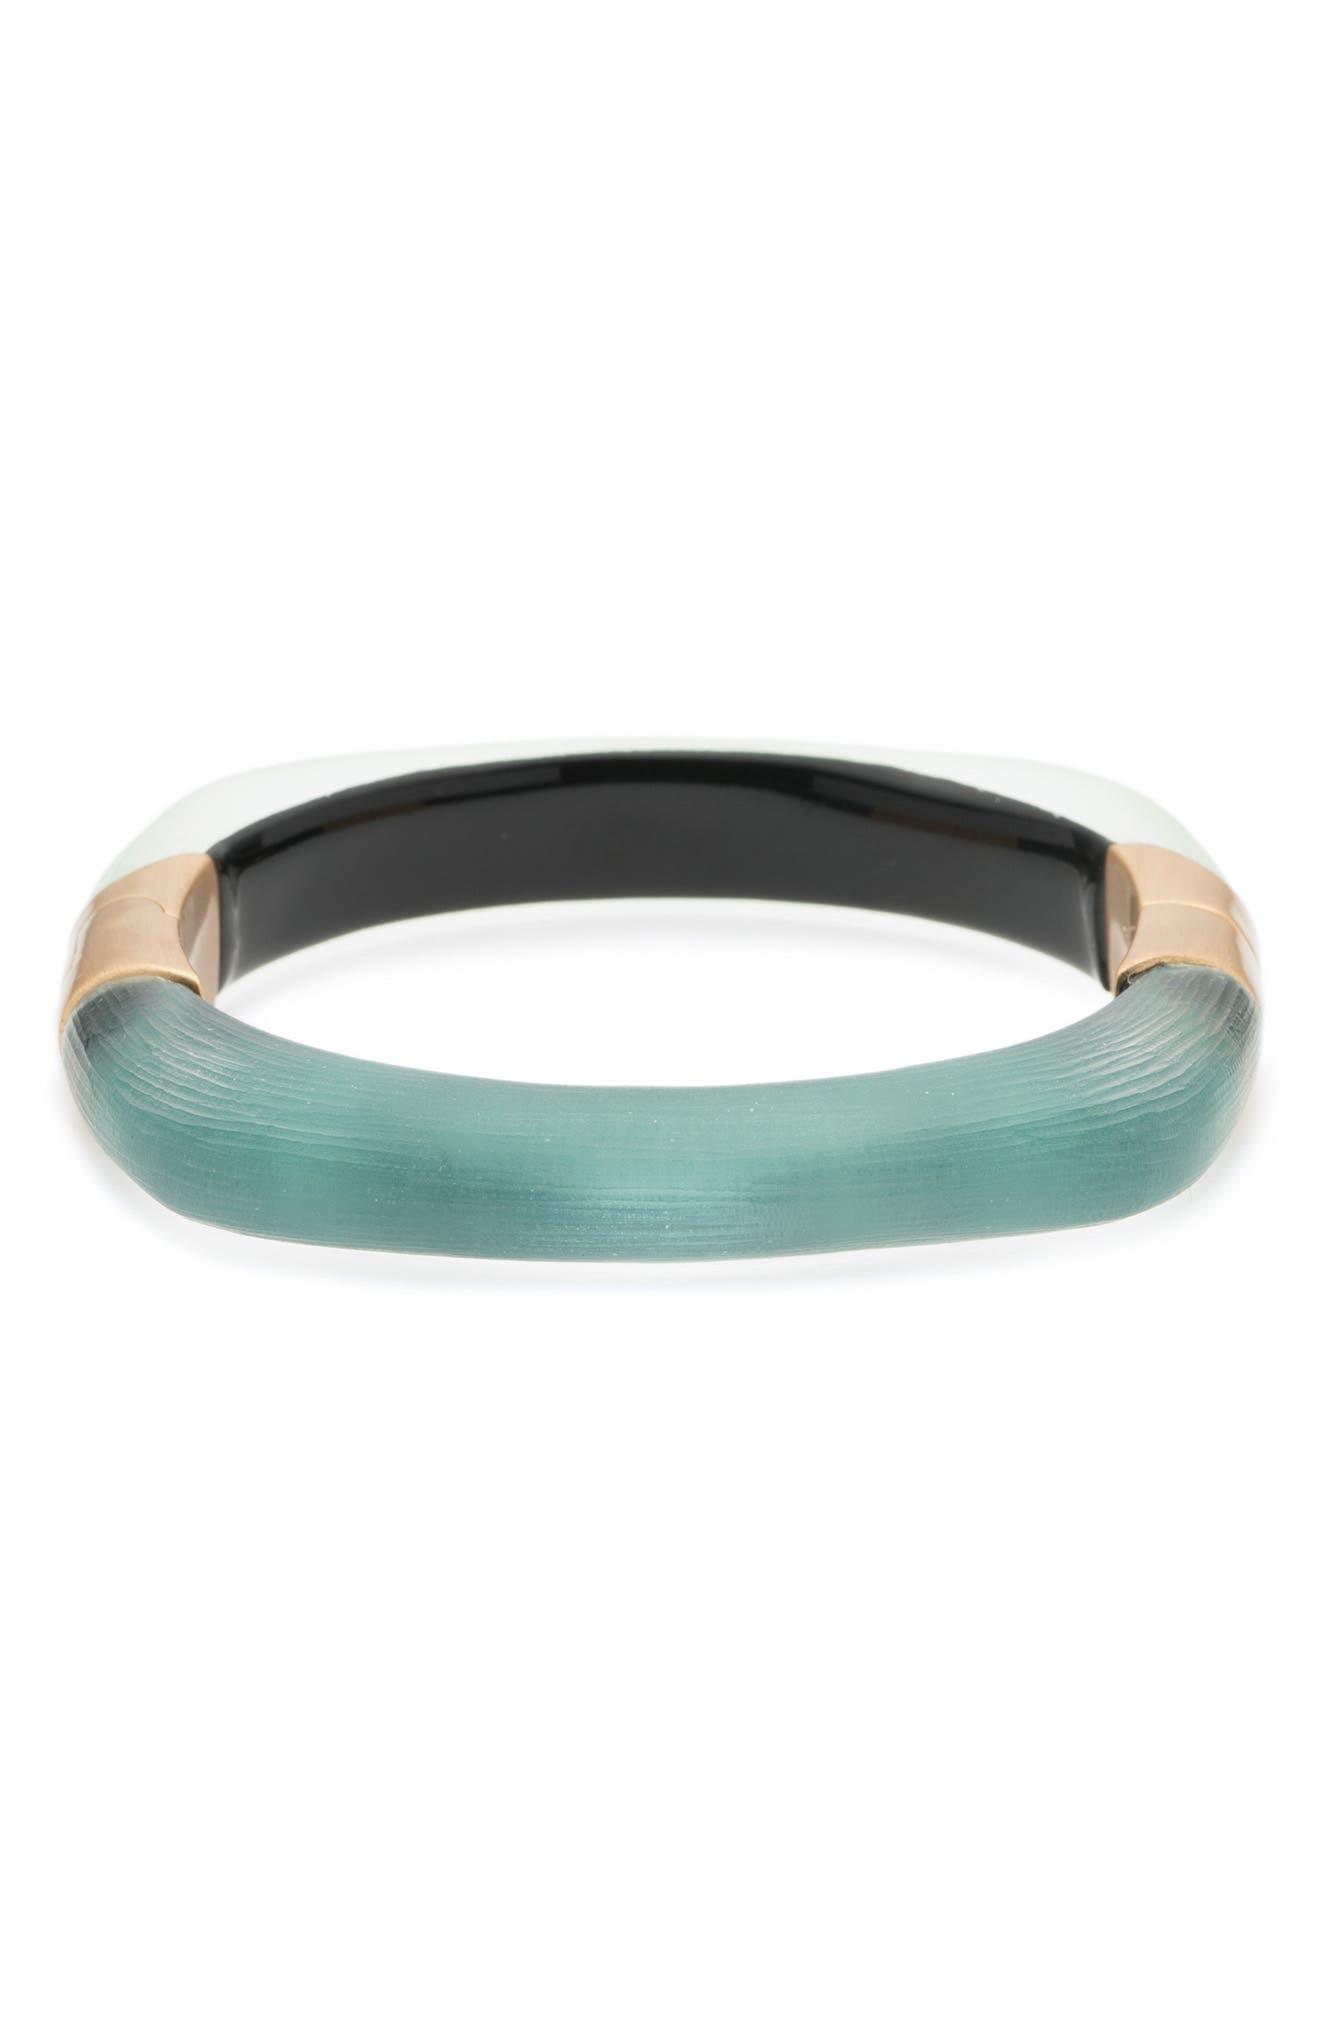 Alexis Bittar Square Colorblocked Hinge Bracelet